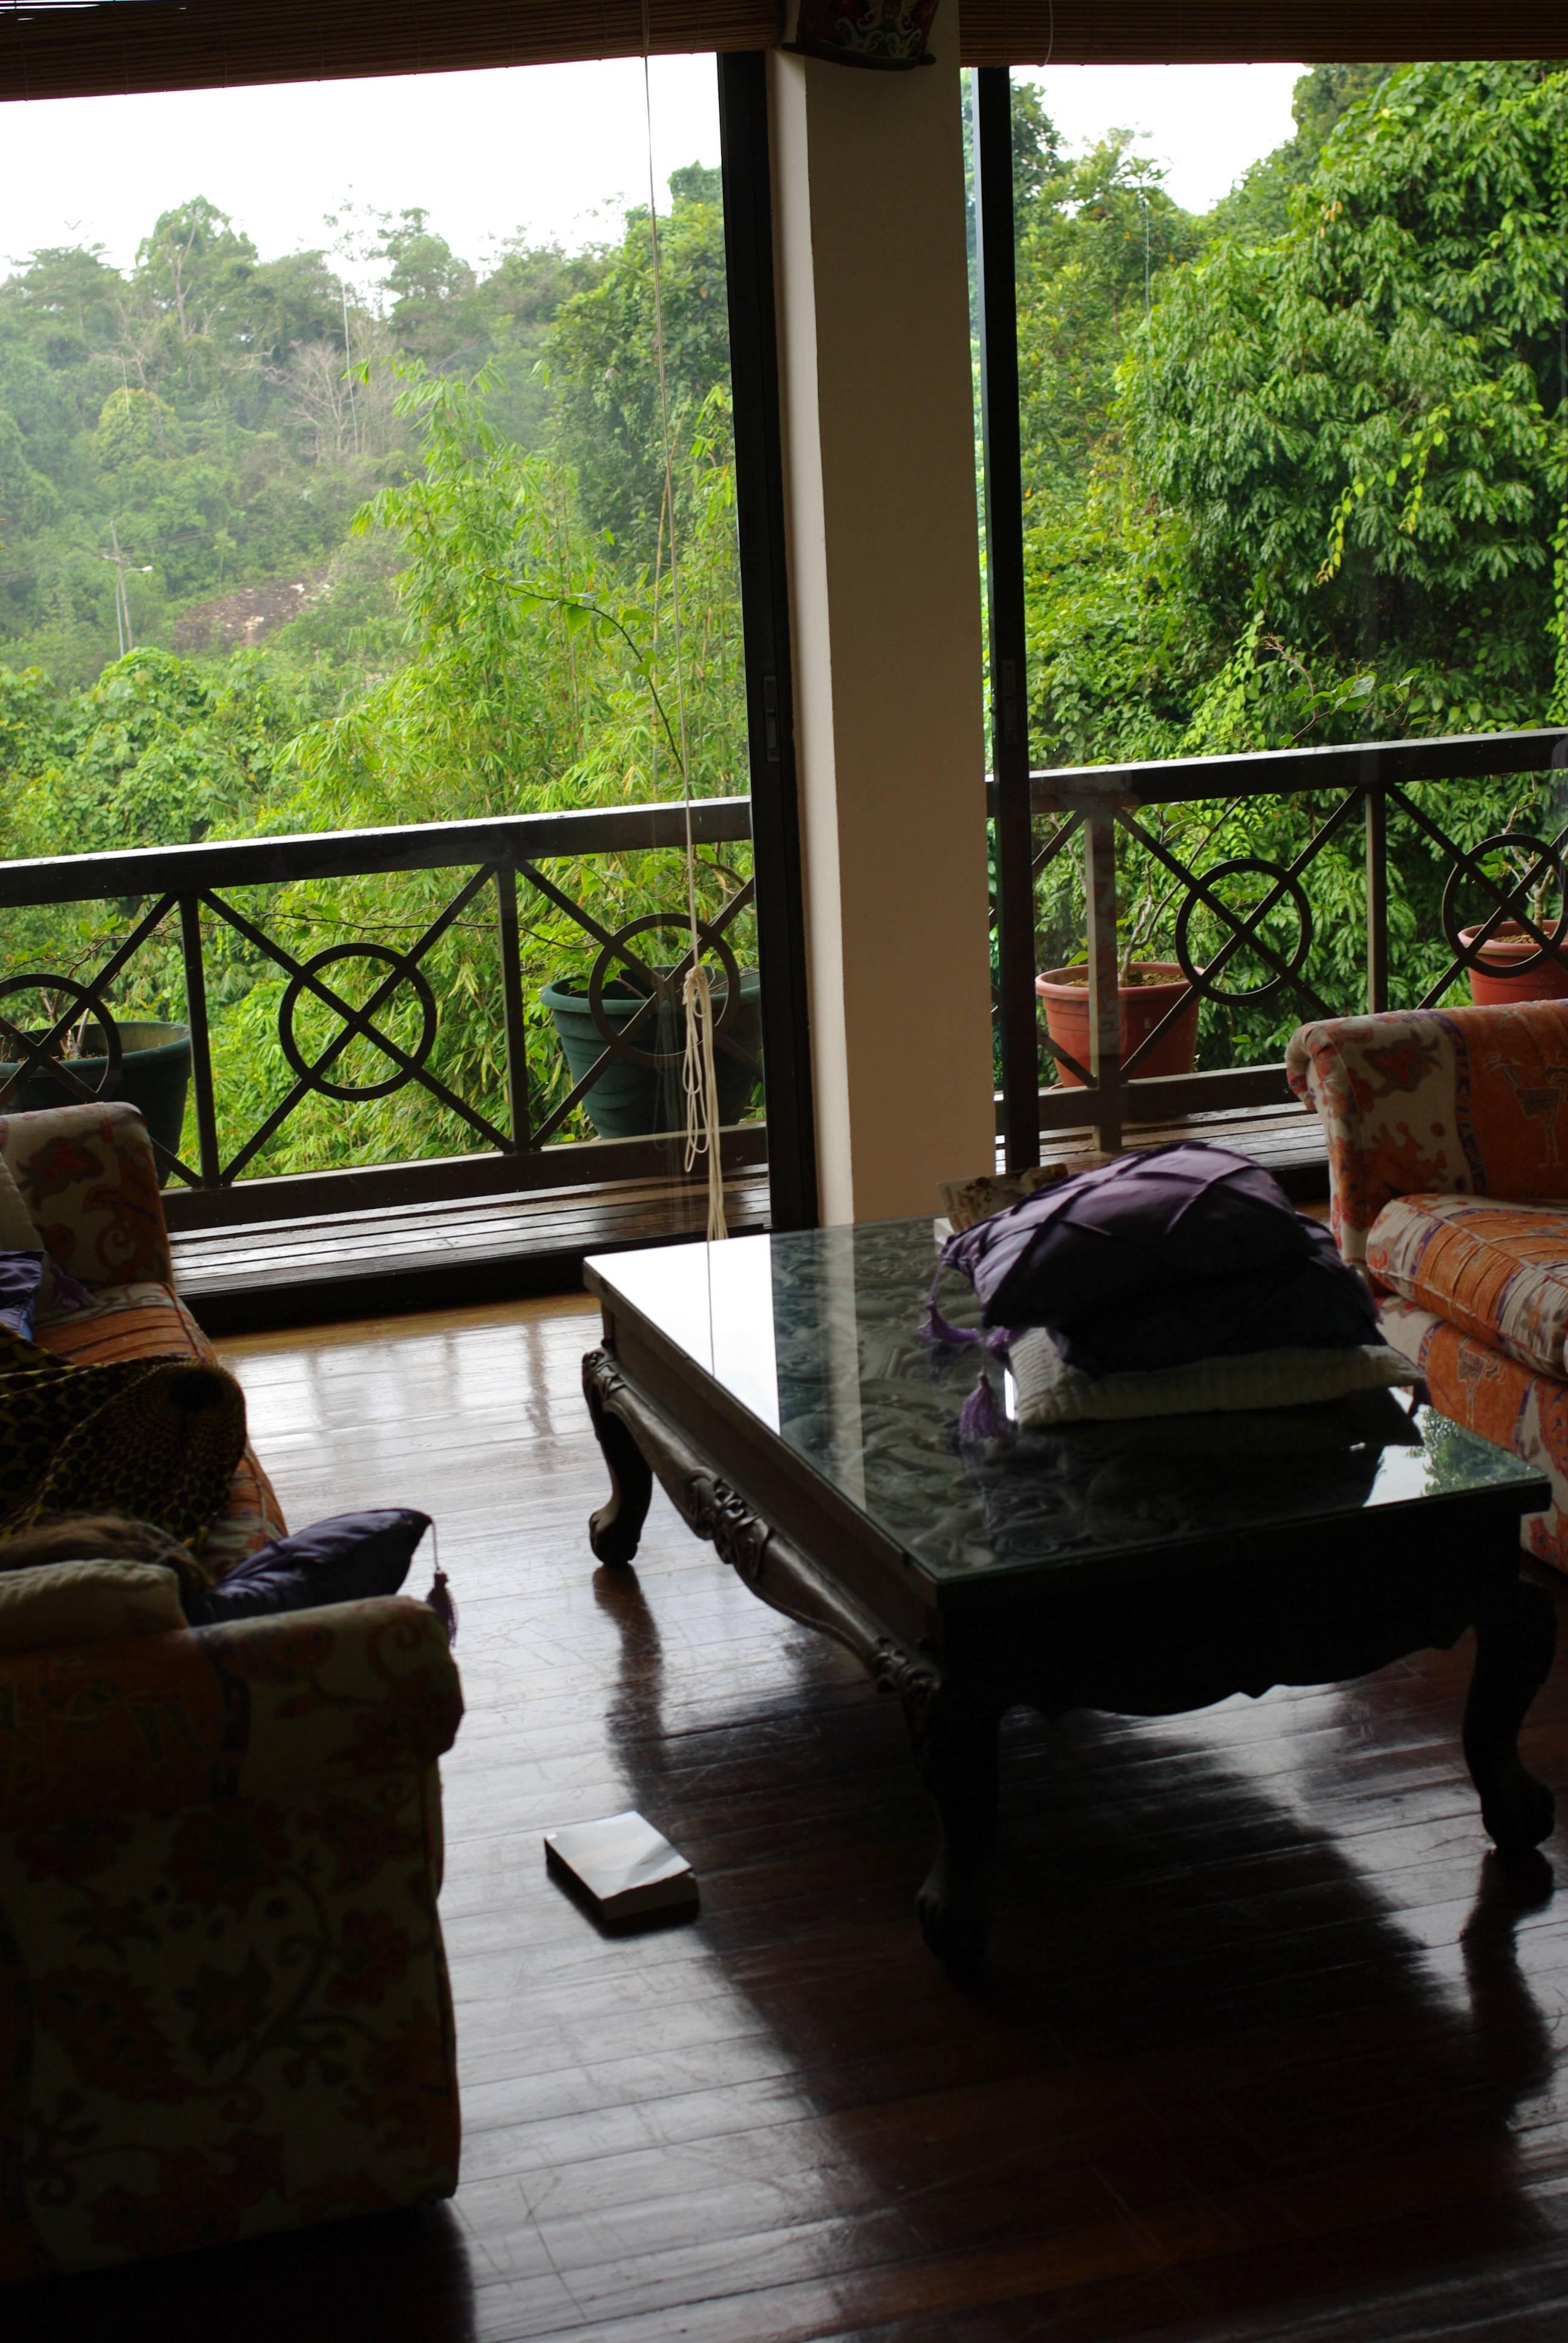 Photo 3: Meilleur hébergement du Sarawak (Bornéo)